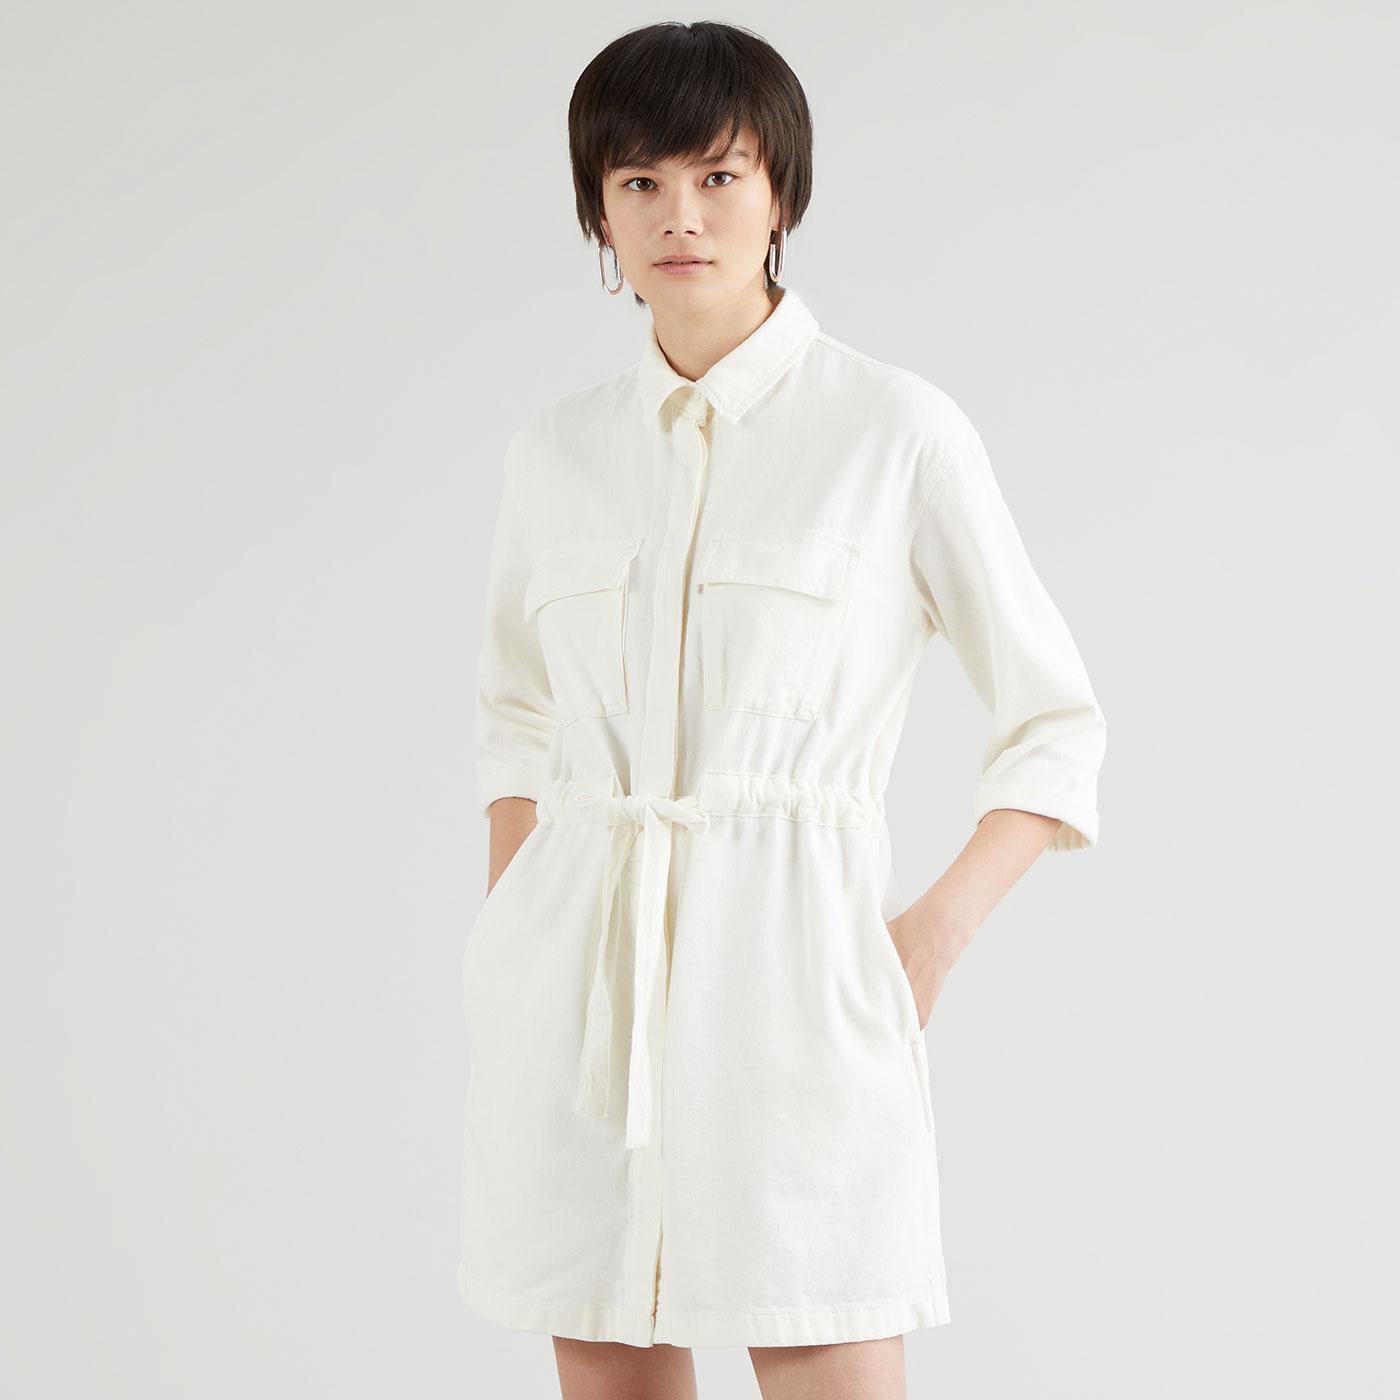 Ainsley LEVI'S Retro Workwear Utility Summer Dress